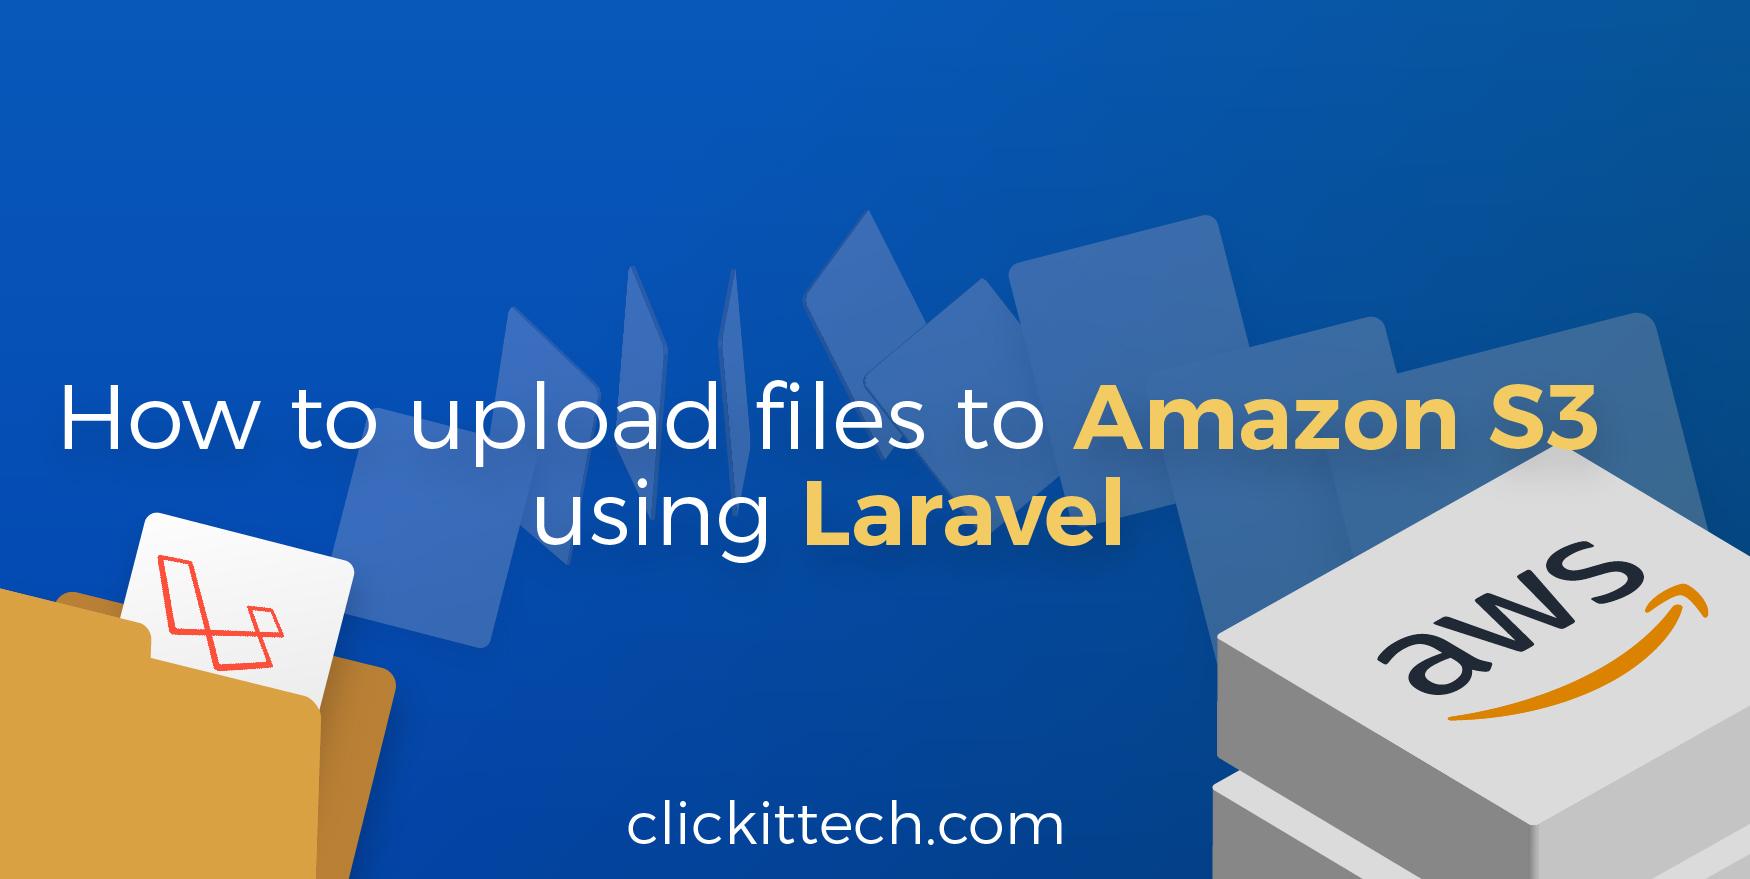 How to upload files to Amazon S3 using Laravel